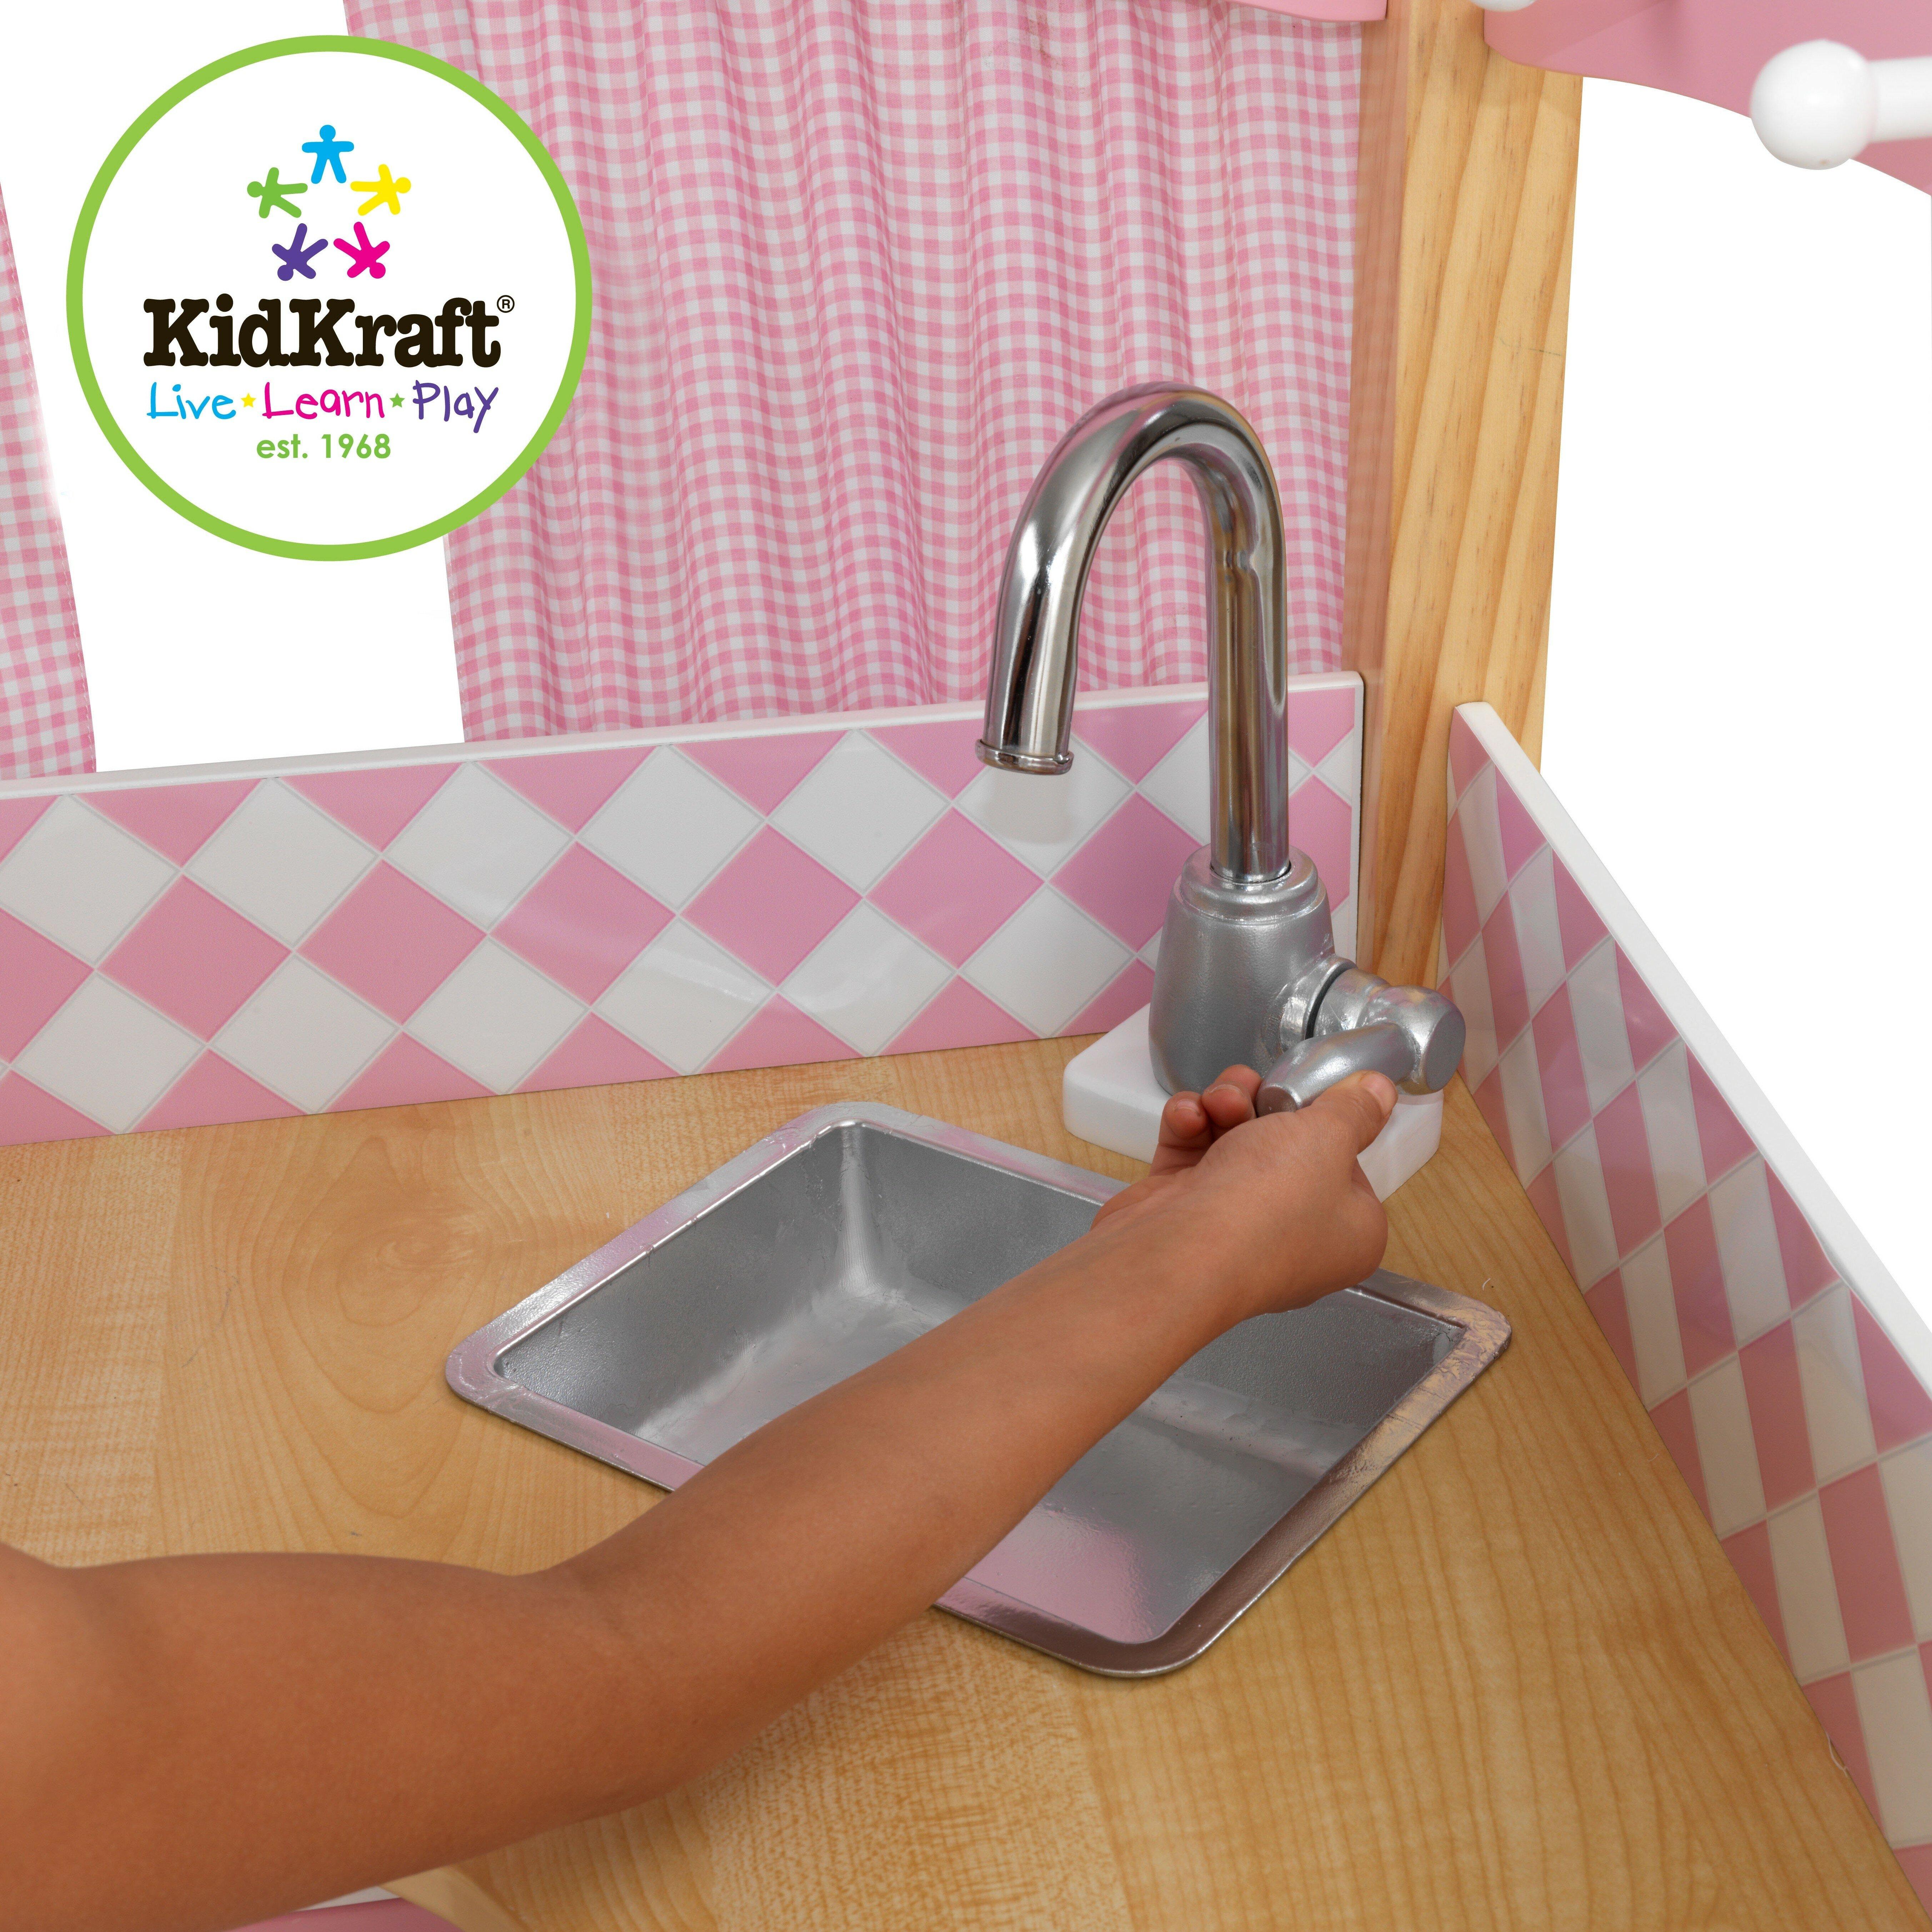 Kidkraft Grand Gourmet Corner Kitchen Reviews